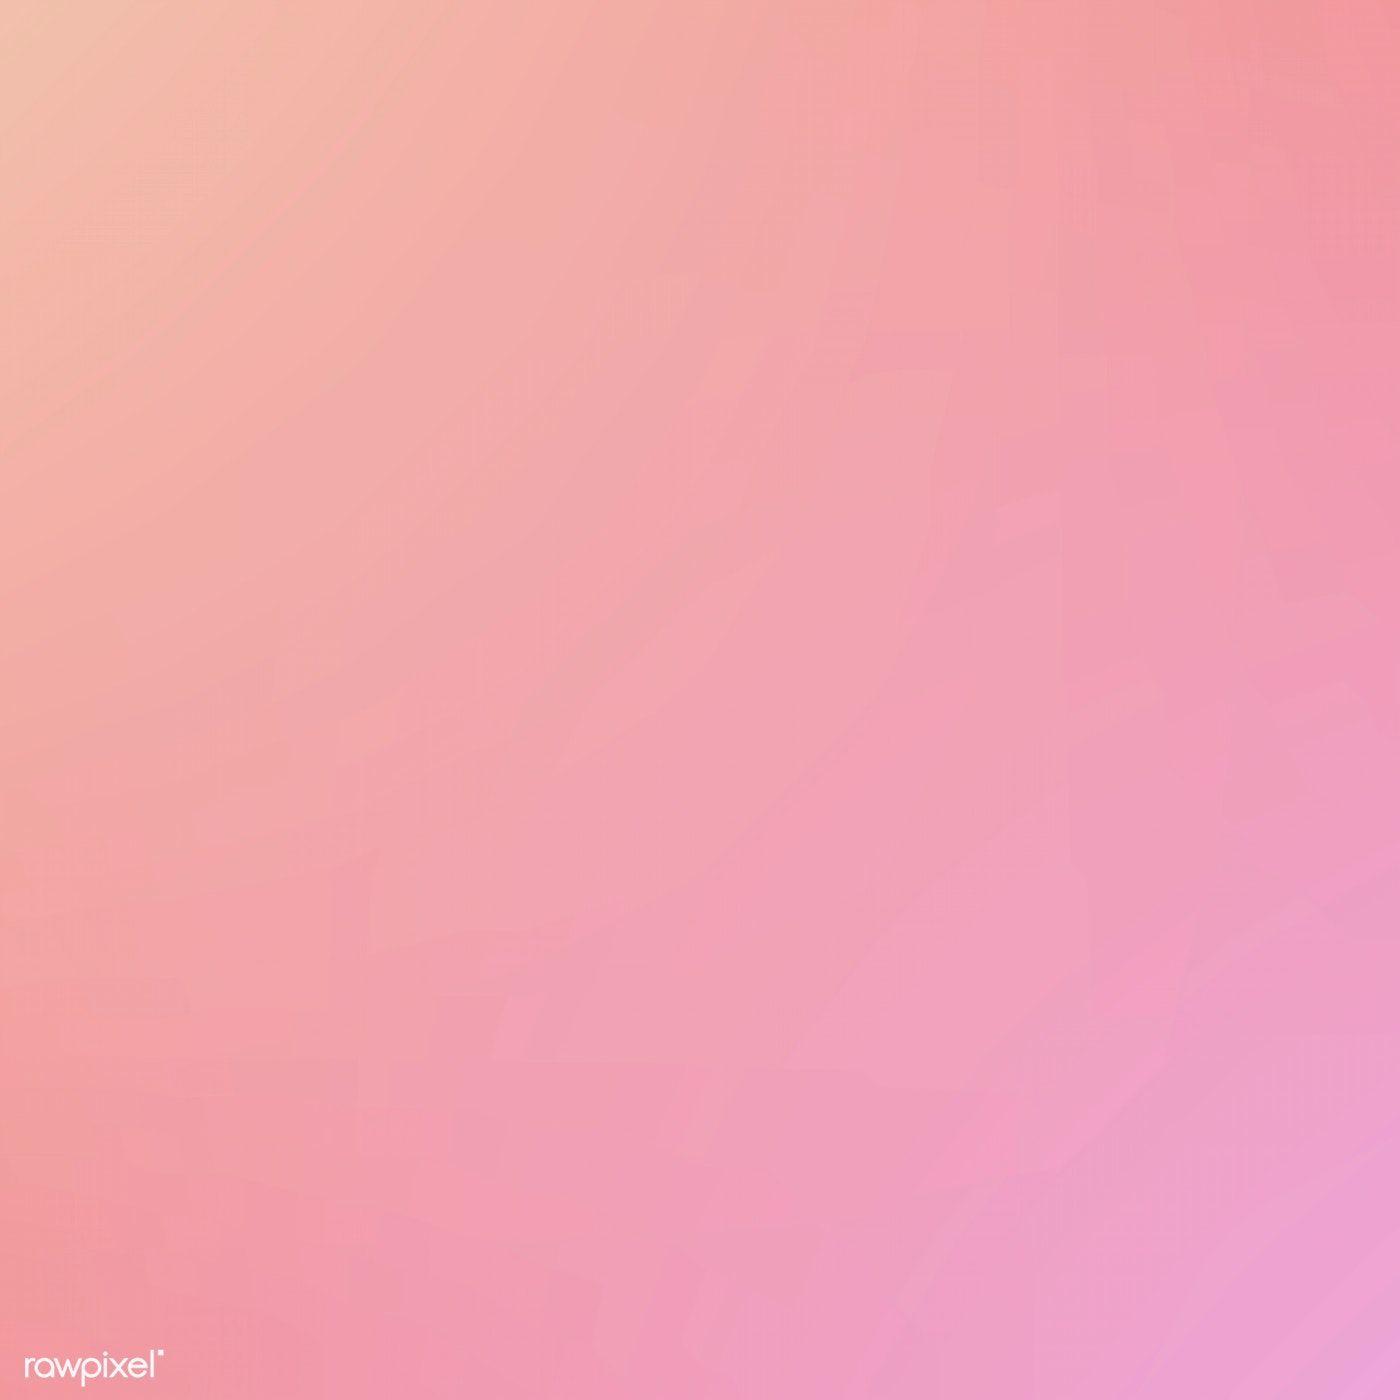 Download premium illustration of Abstract pastel gradient